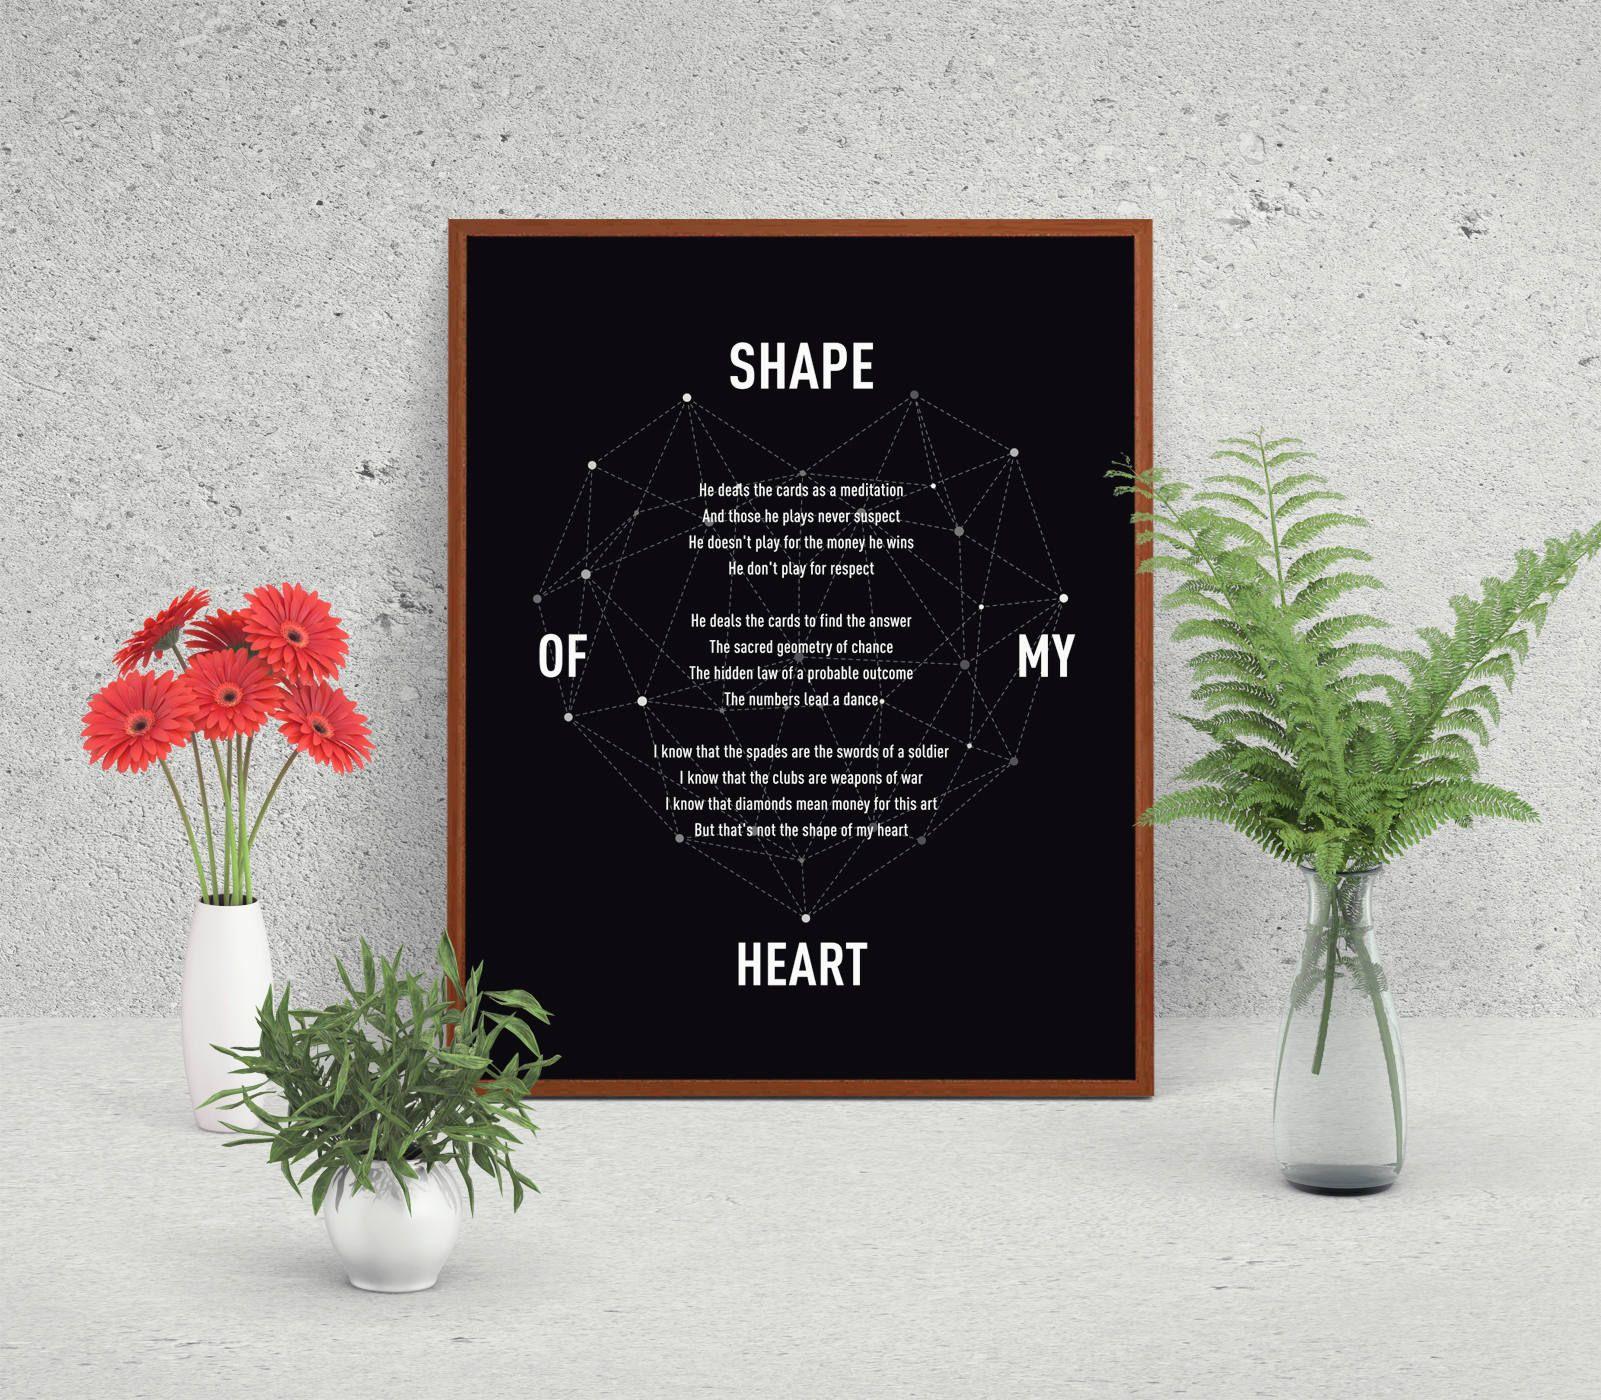 Shape Of My Heart Sting Song Lyric Print Minimalist Poster Song Lyric Art Geometric Heart Gift For Her Pr Lyric Prints Song Lyrics Art Song Lyric Print